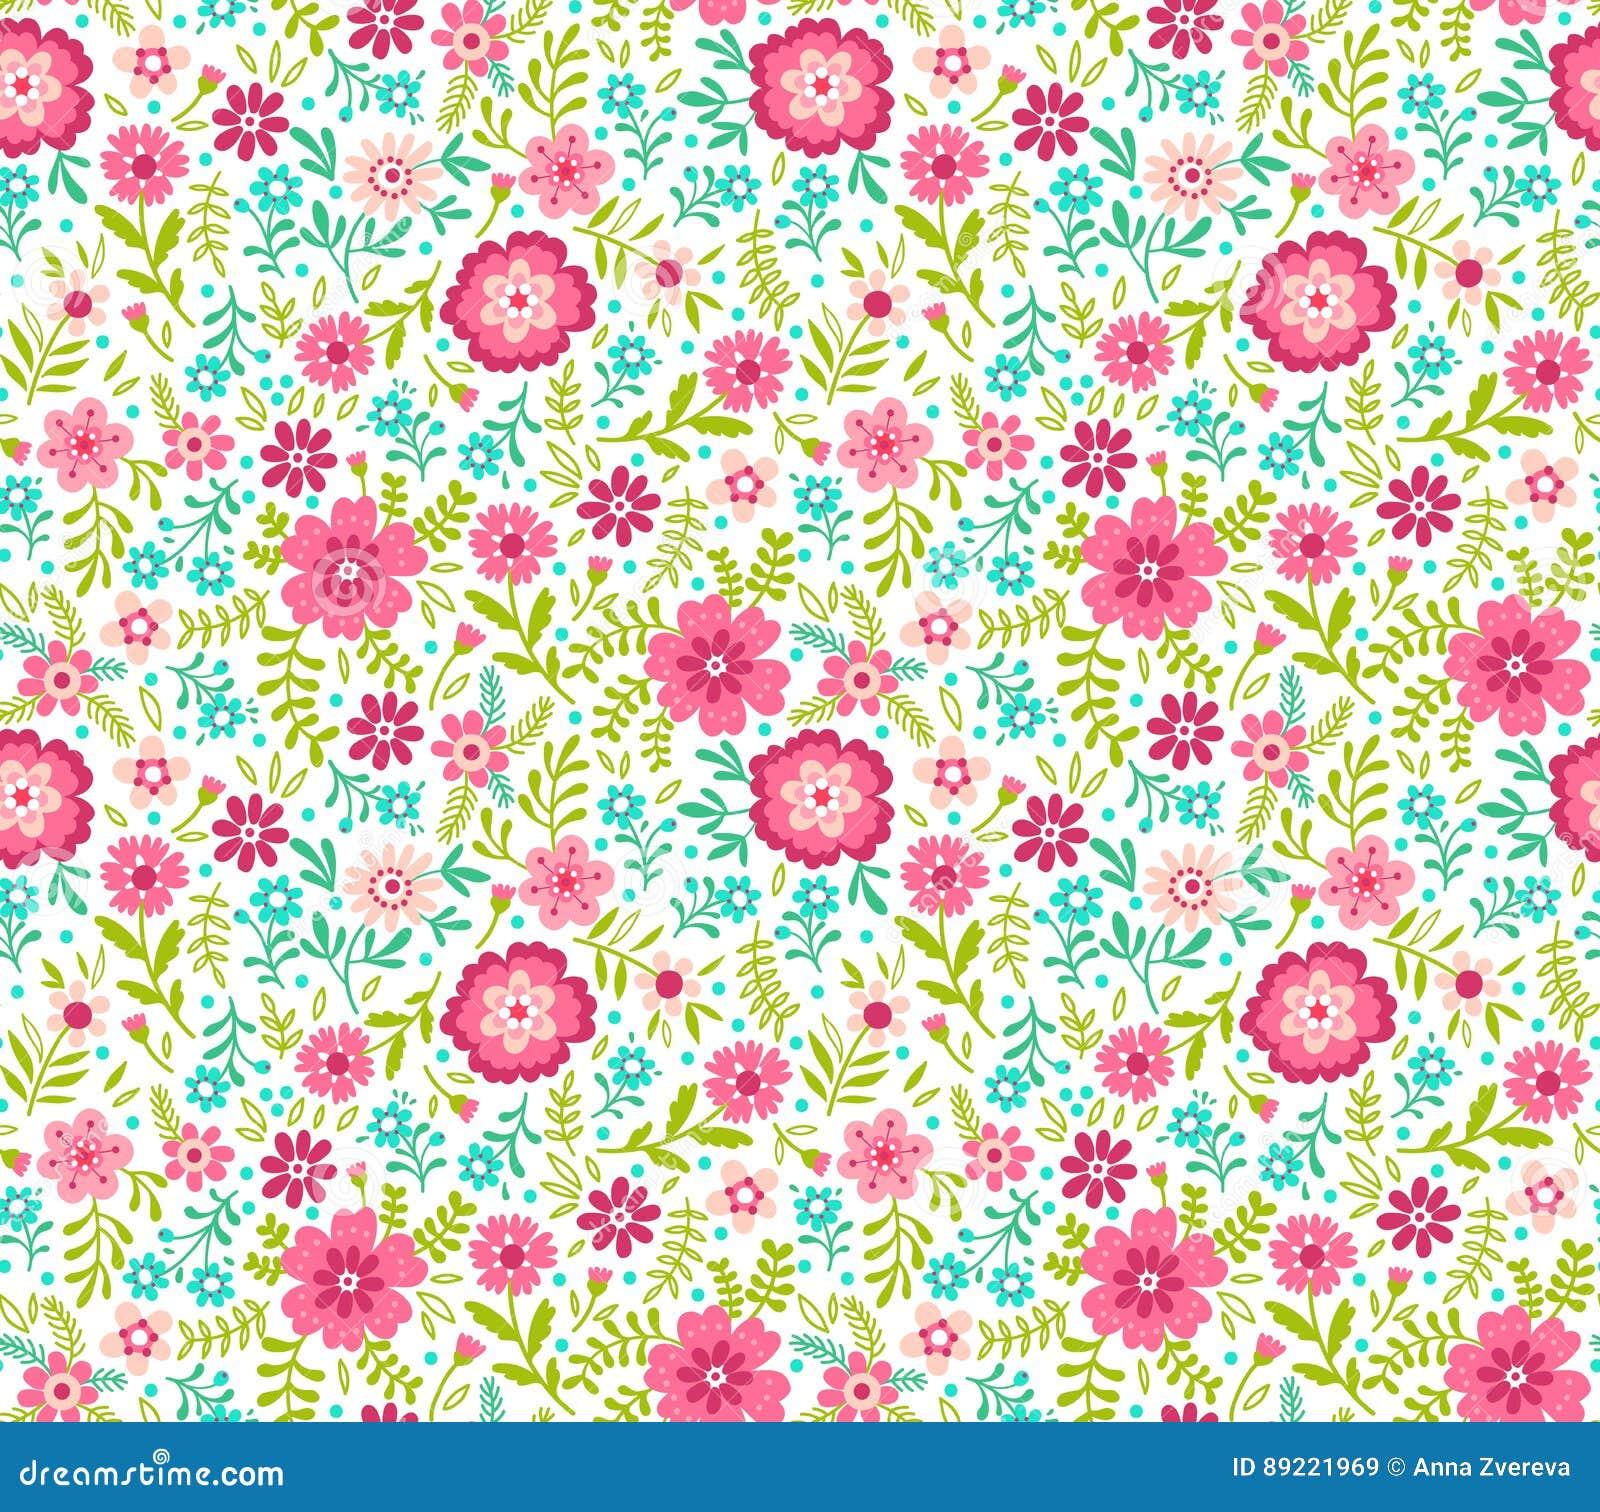 Cute Floral Pattern Stock Illustration Illustration Of Flower